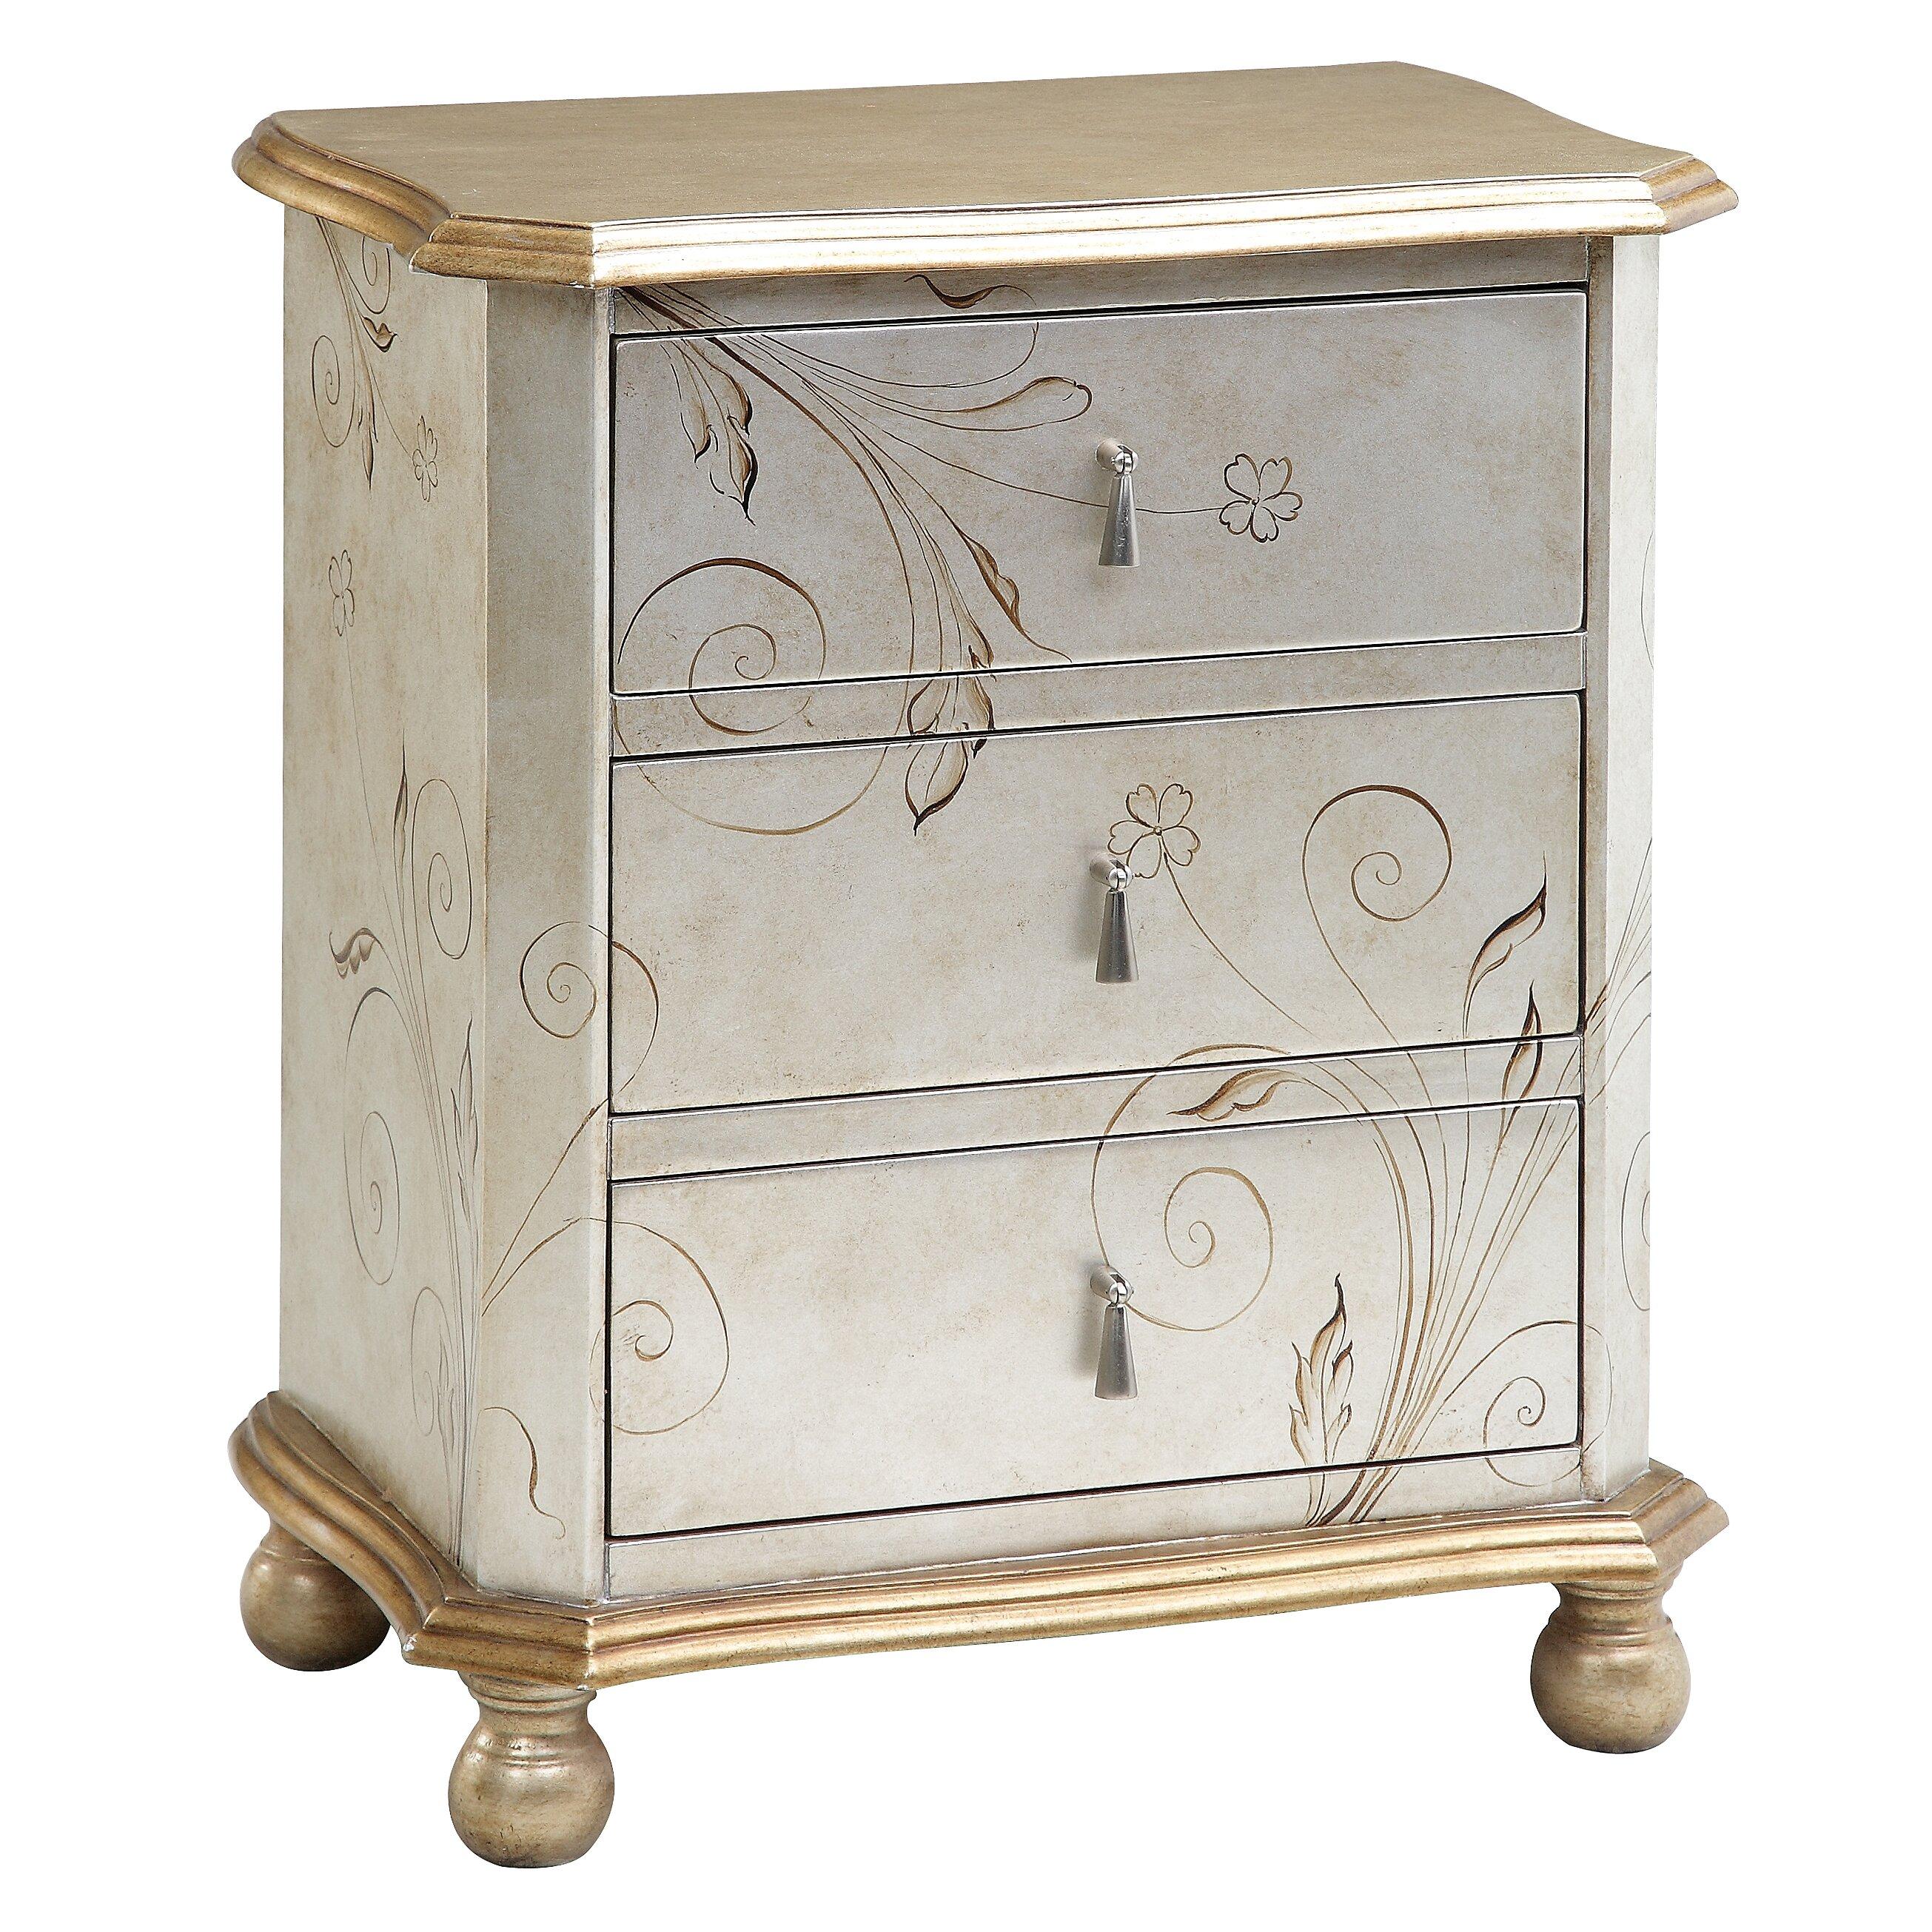 august grove avis 3 drawer chest reviews wayfair. Black Bedroom Furniture Sets. Home Design Ideas